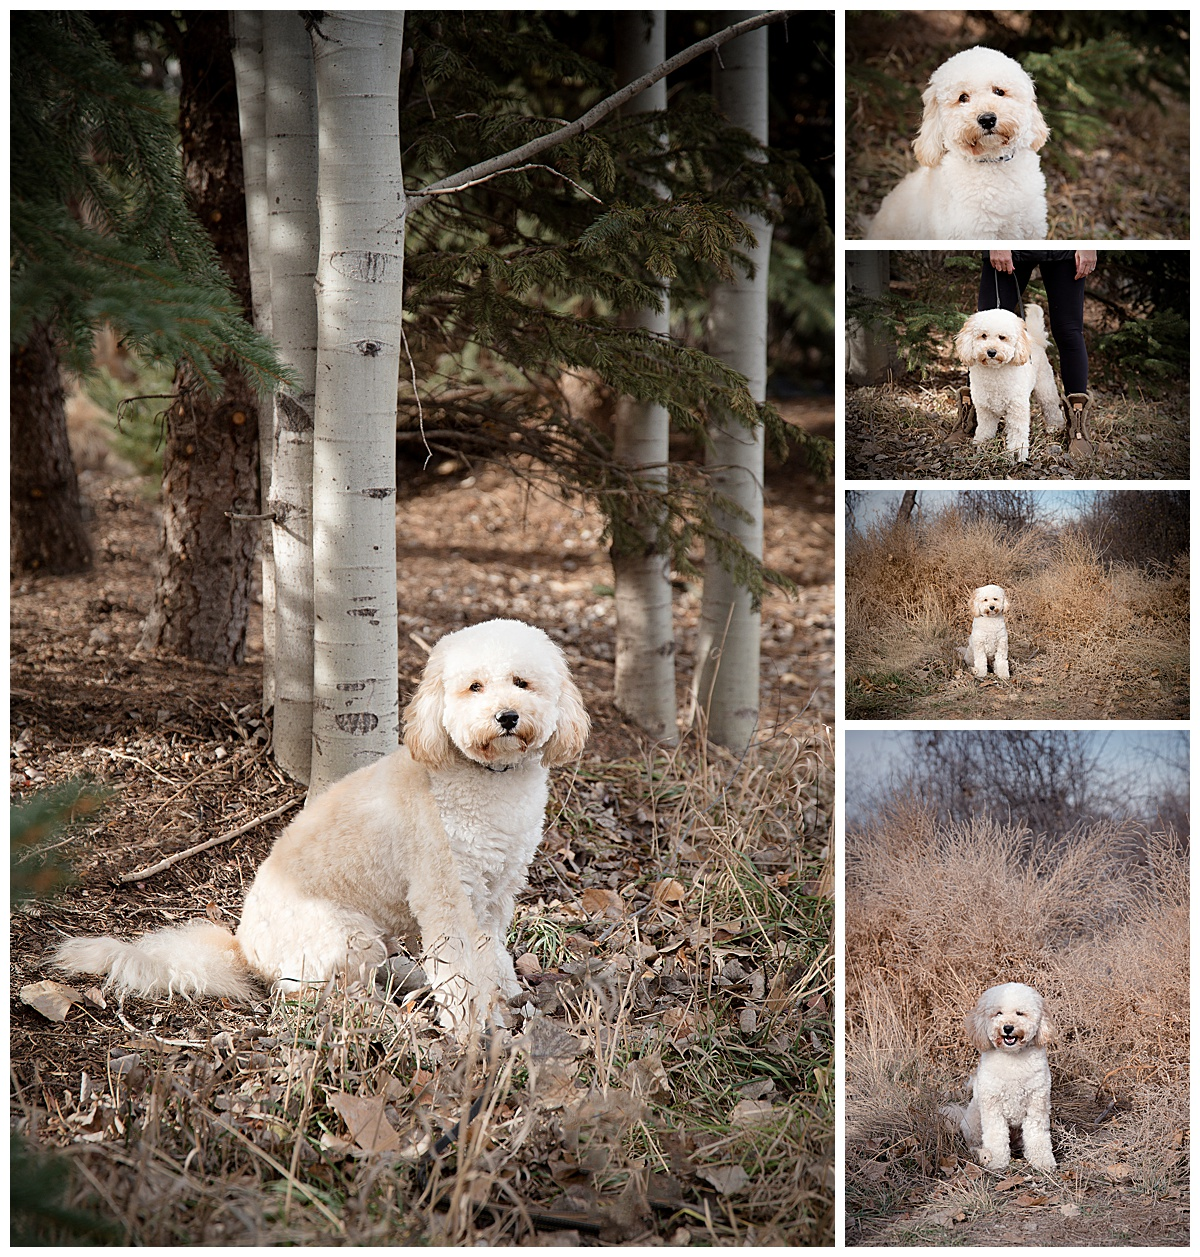 dog-photography-greenwood-village-colorado-bear-2.jpg